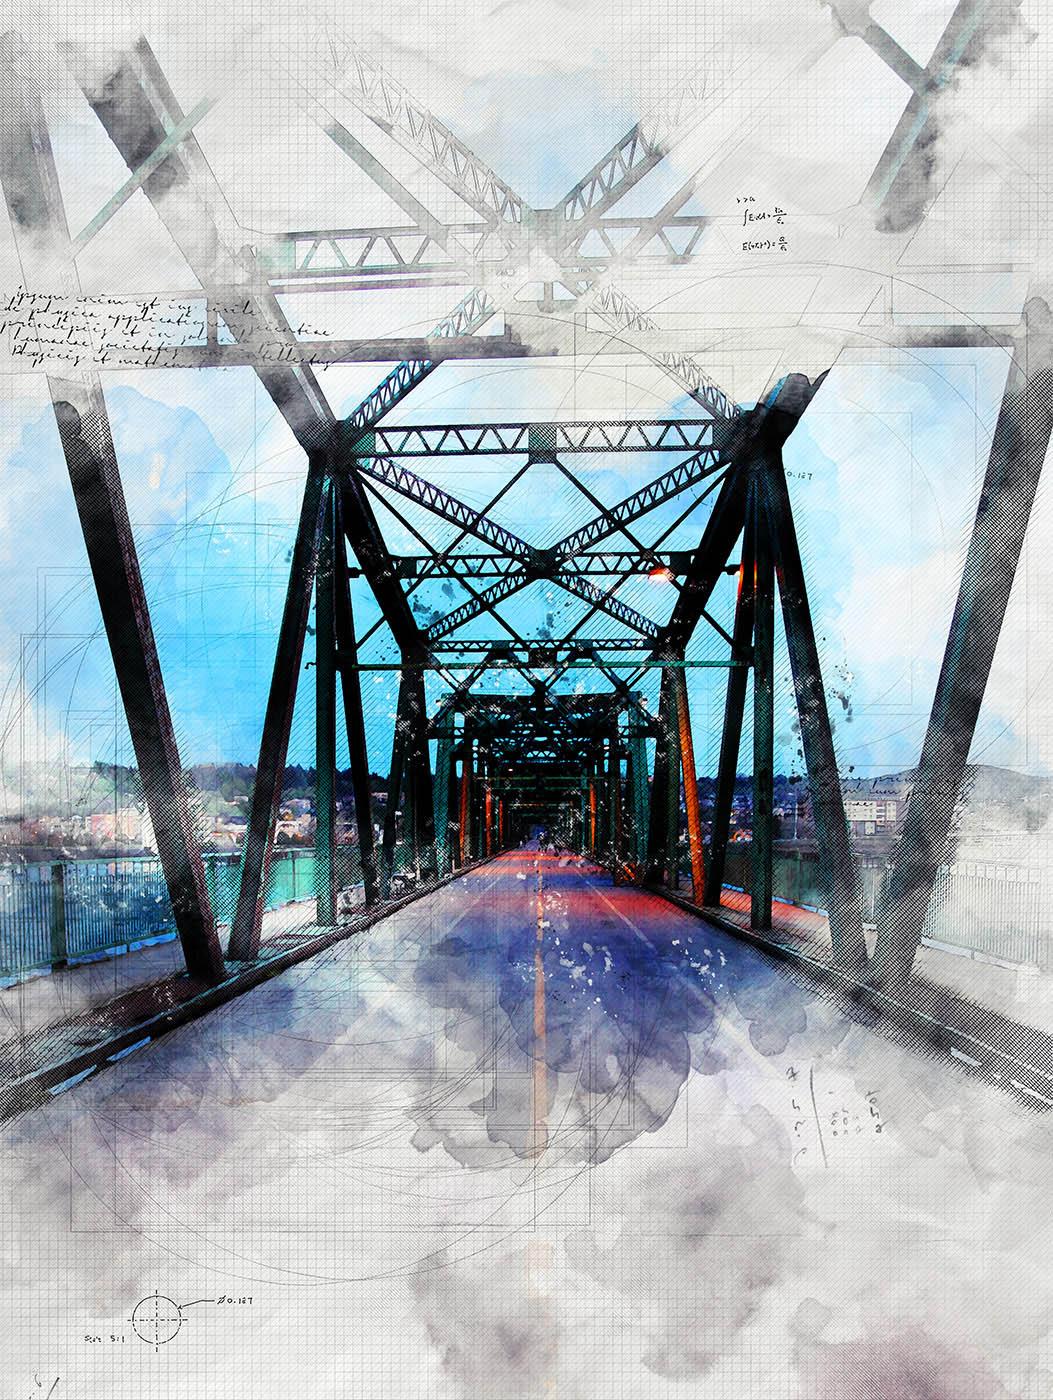 Old Saguenay City Bridge Sketch Image - Royalty-Free Stock Imagery